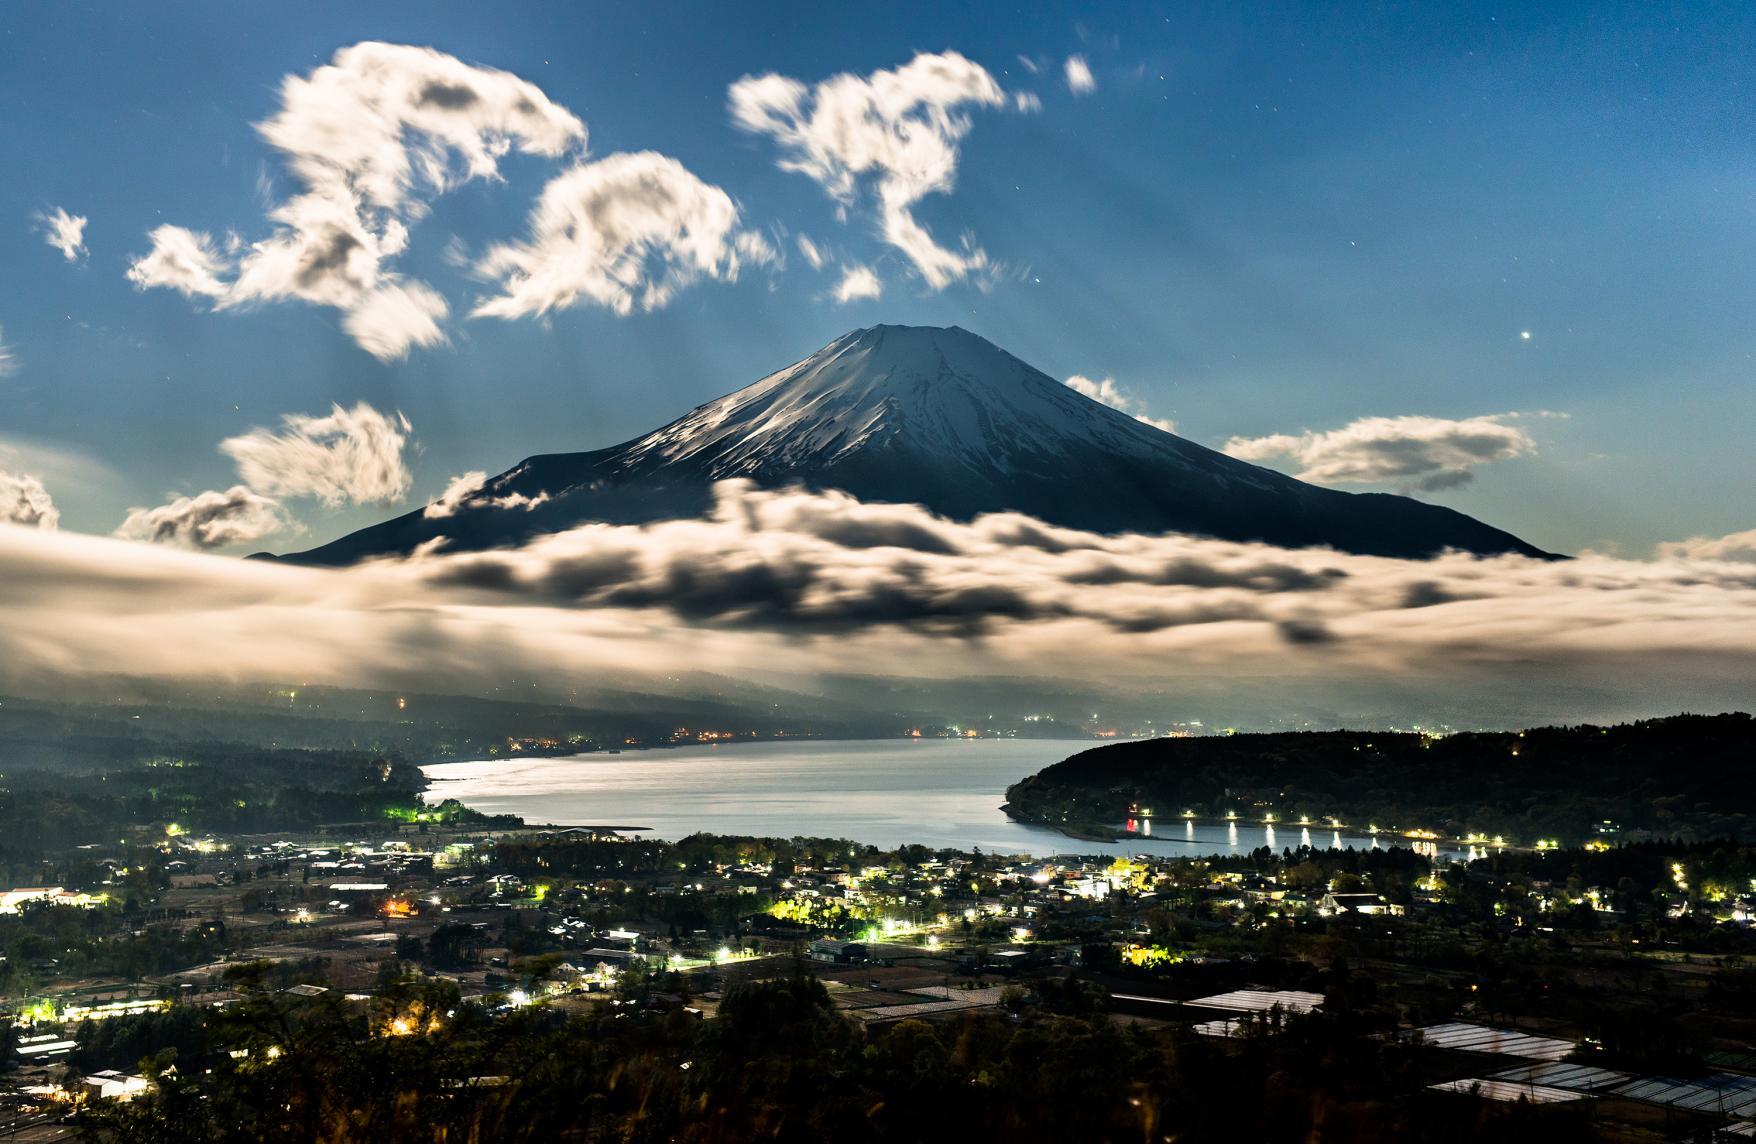 Lake Yamanakako, the closest lake to Mt.Fuji